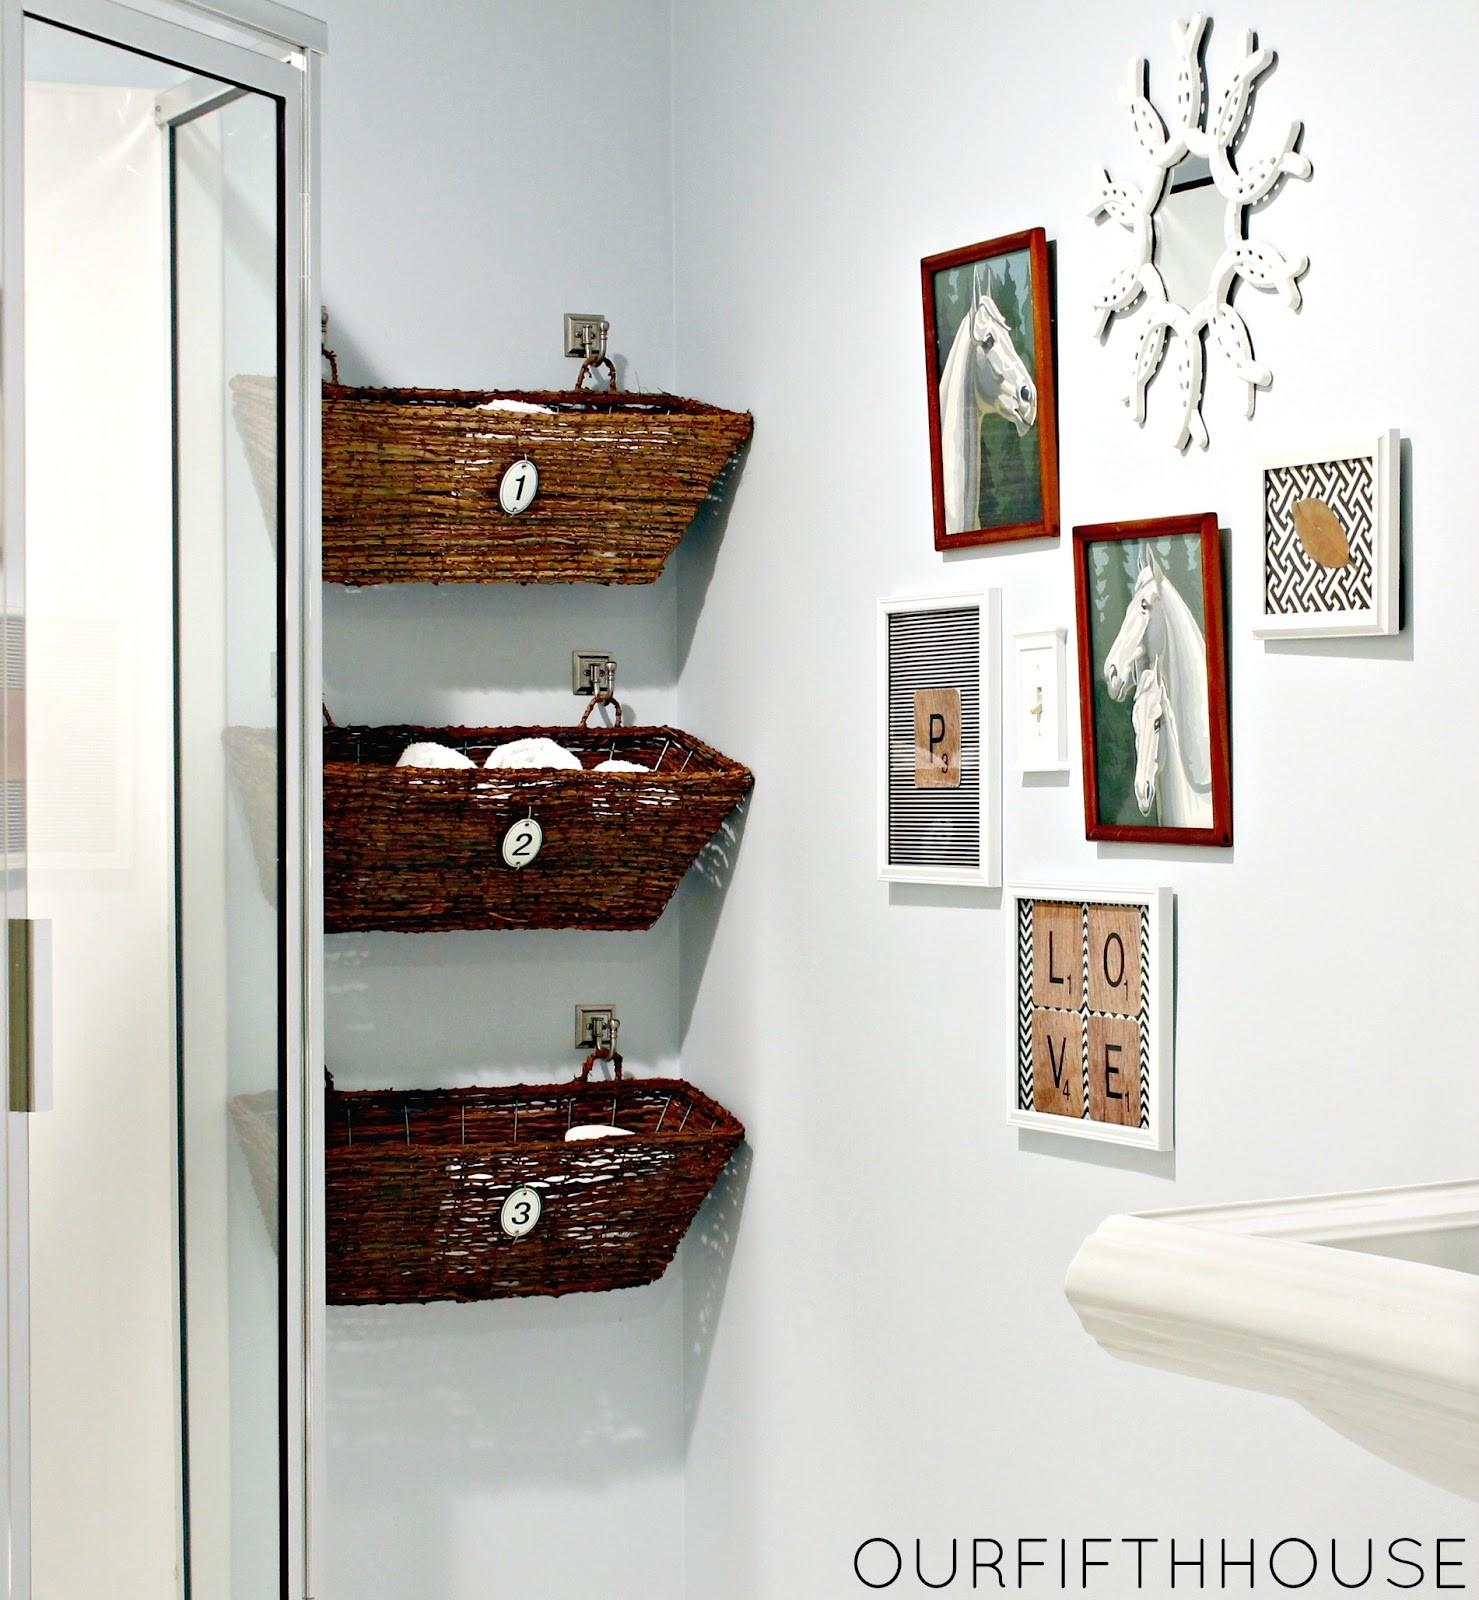 Storage Ideas for Small Bathrooms Fresh Small Bathroom Storage Ideas Wall Storage solutions and Décor